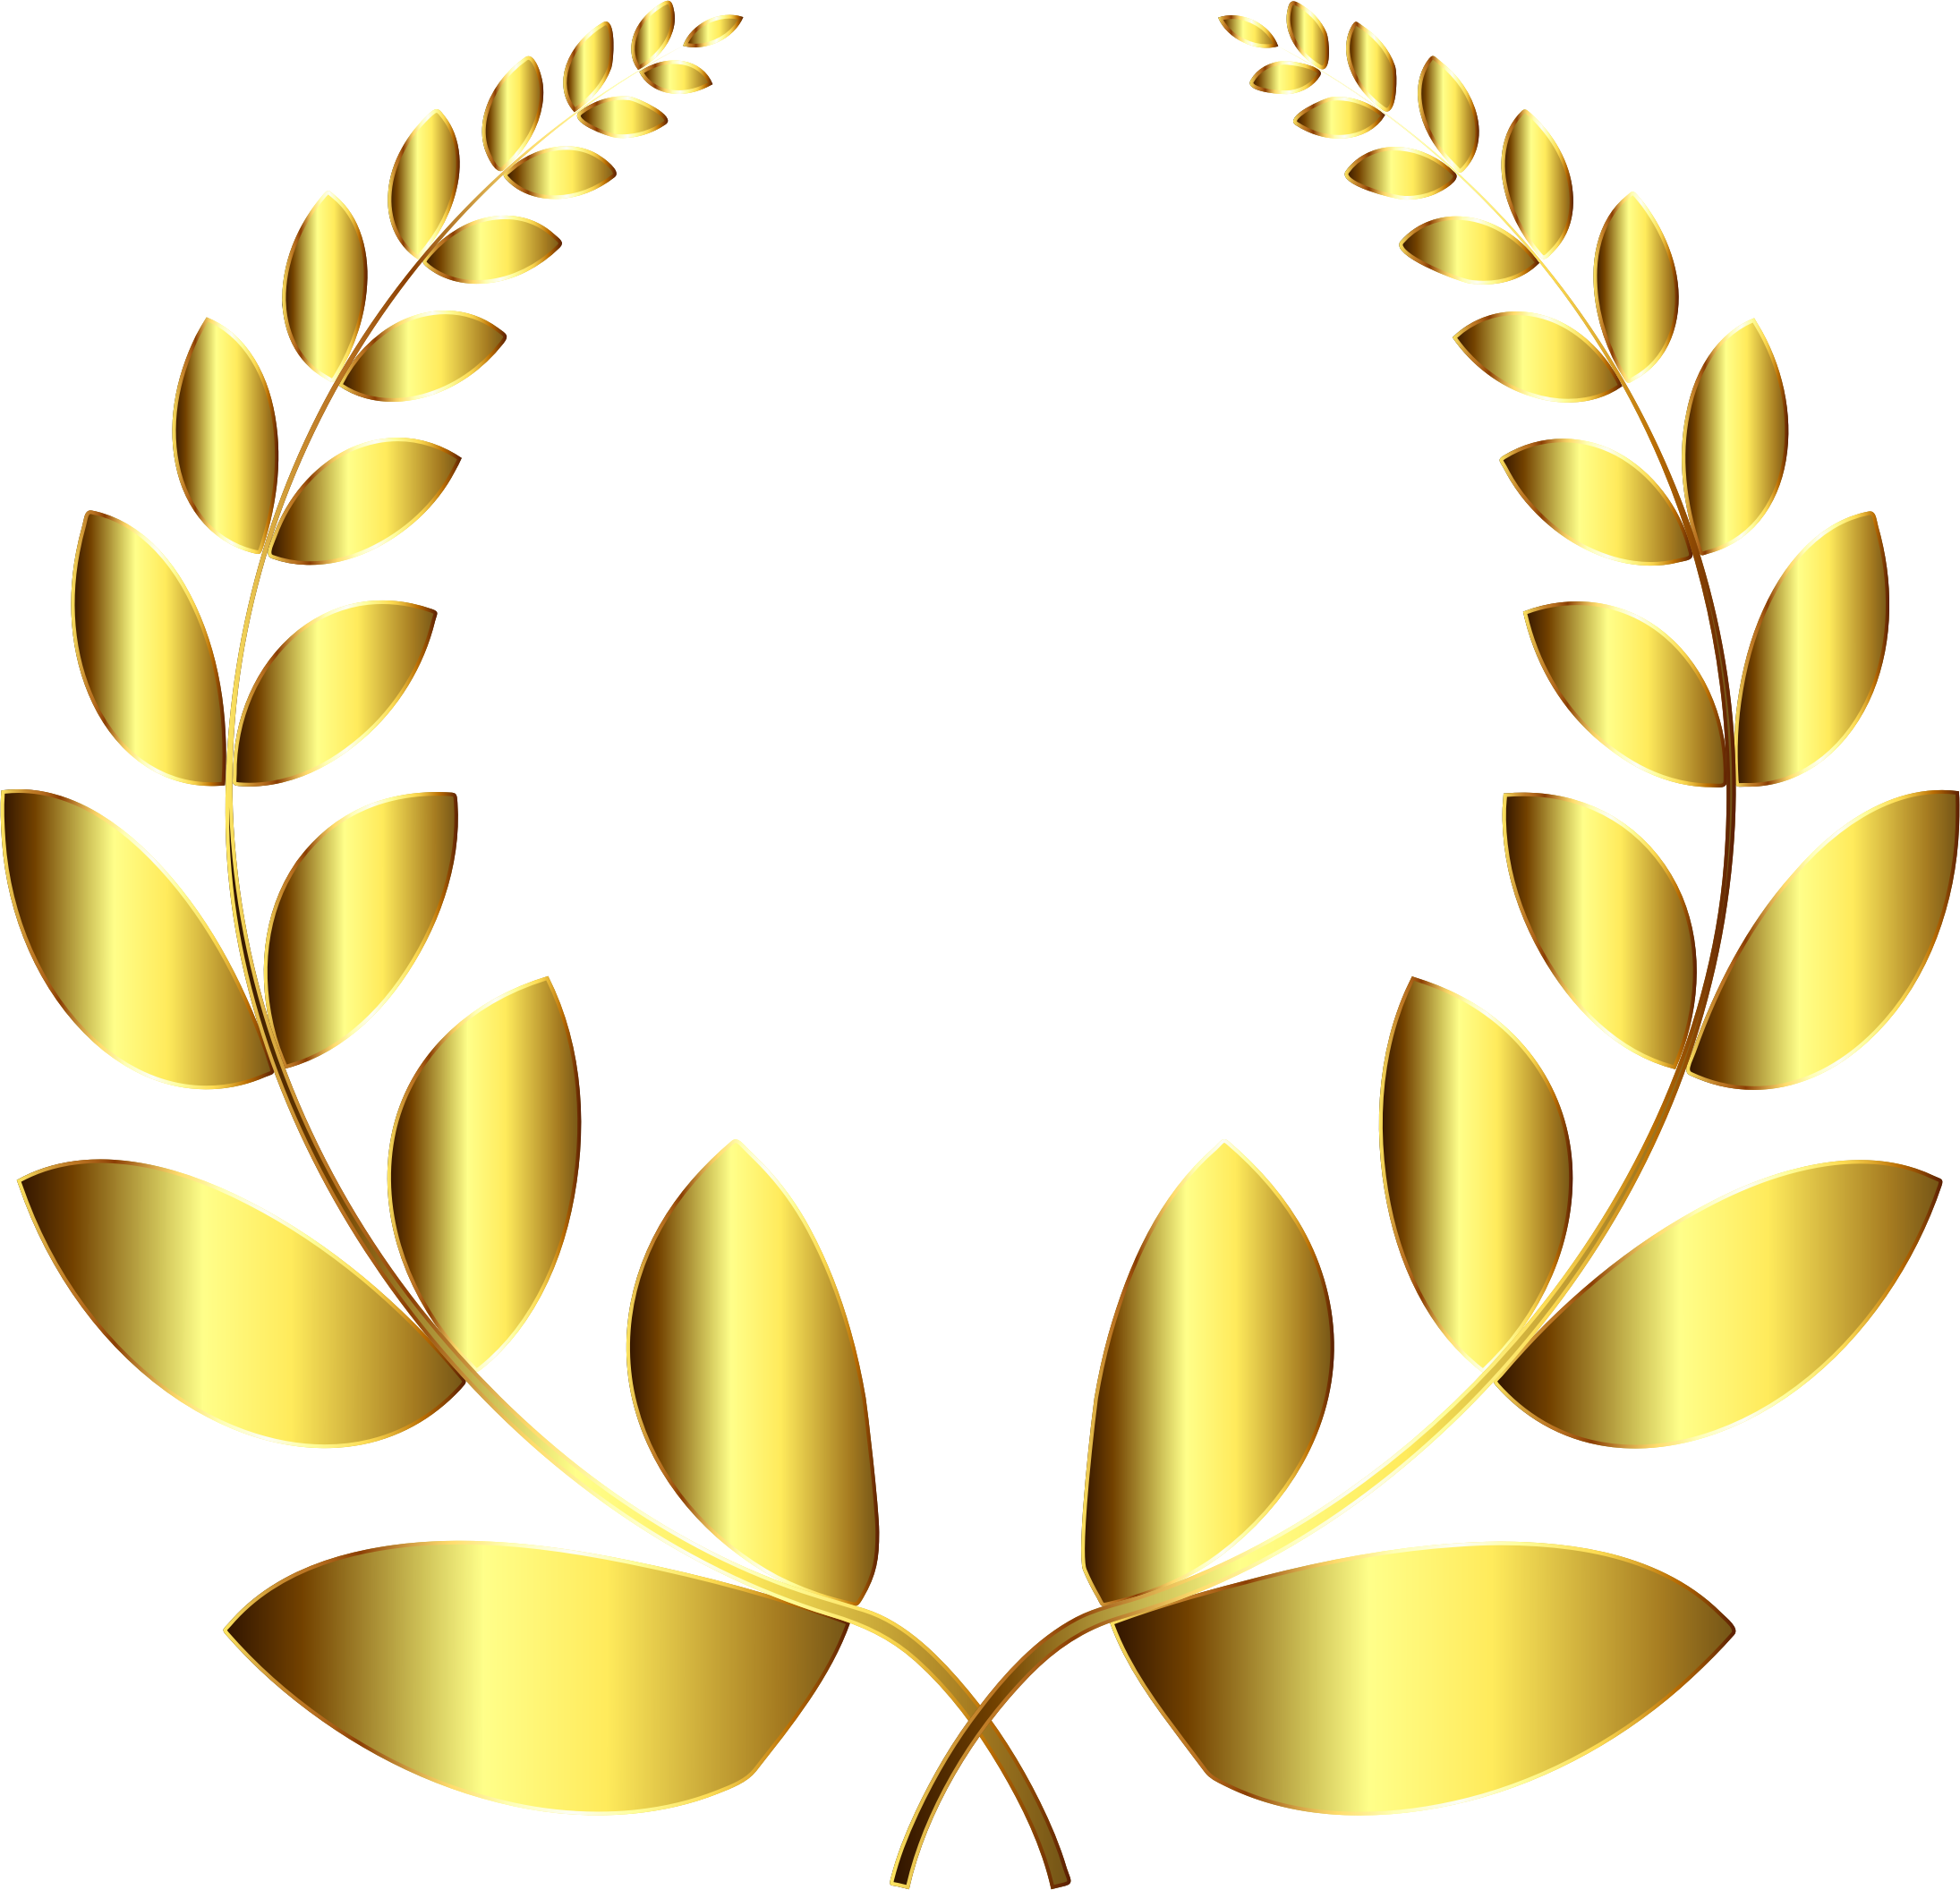 graphic transparent library Gold wreath no background. Laurel clipart clip art.